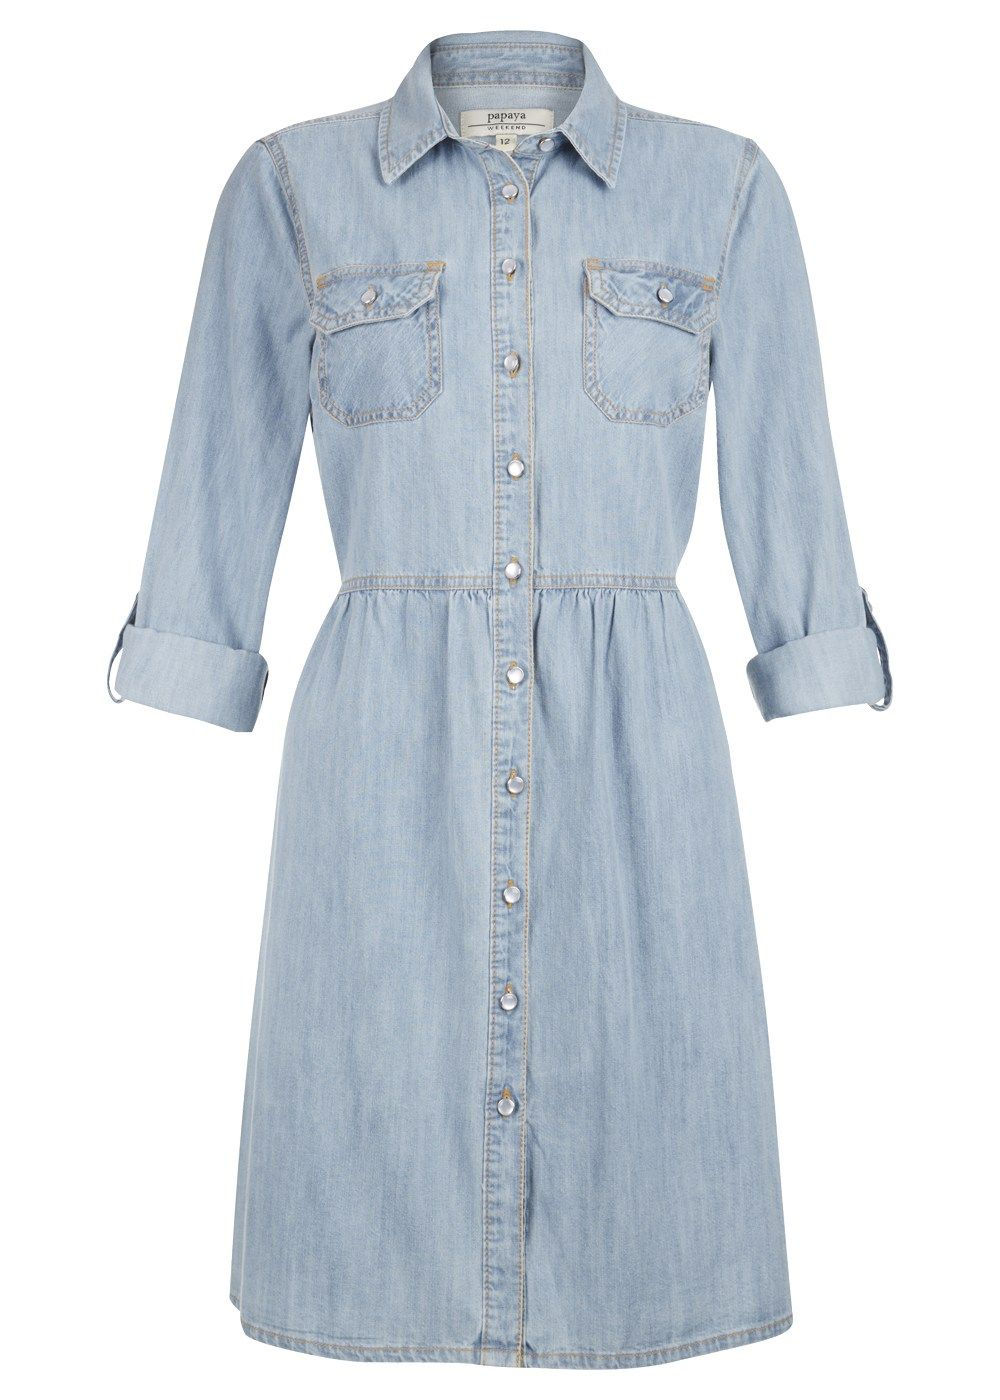 Pleated maxi dress matalan direct – Dresses buy shop